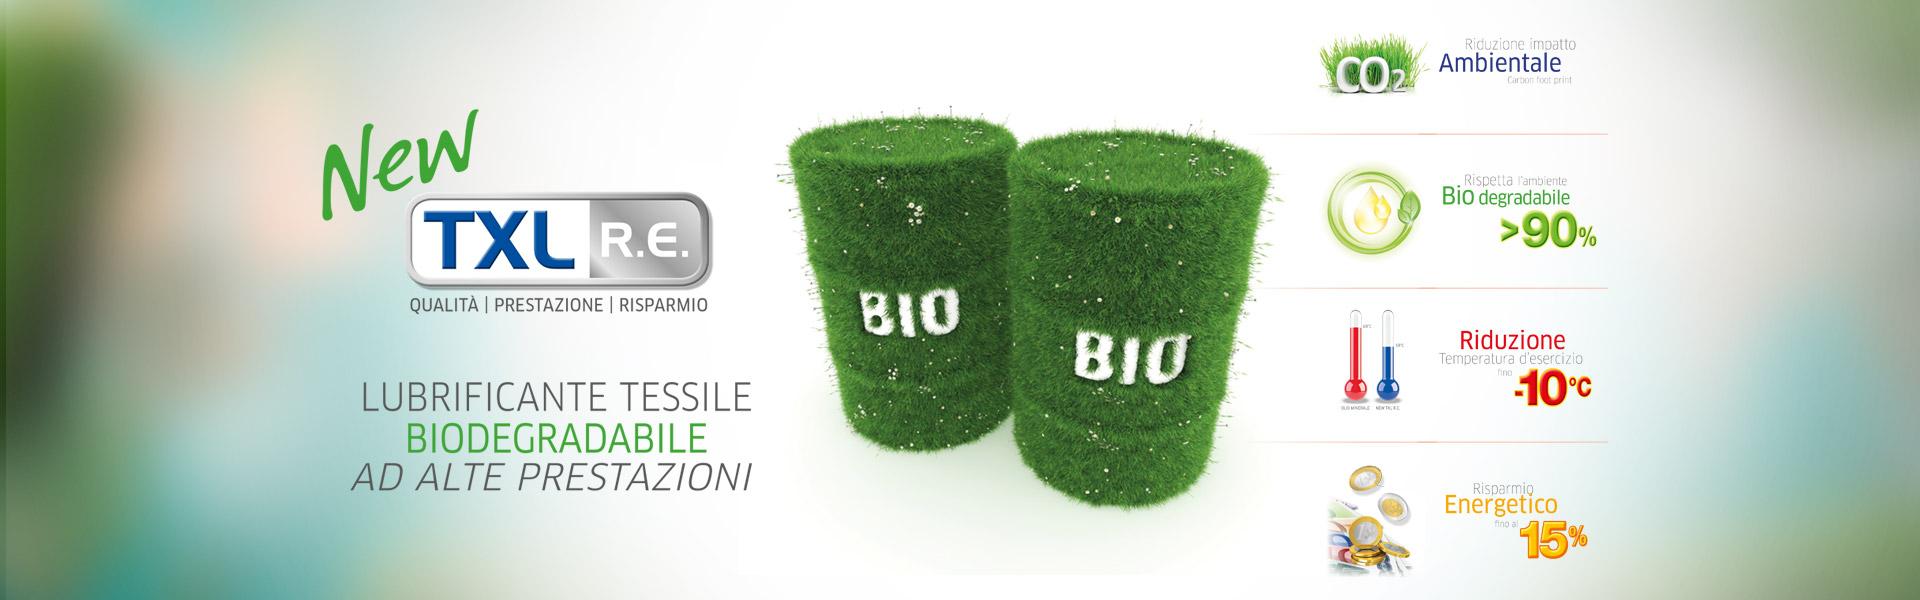 new-txl-lubrificanti-settore-tessile-tbm-srl